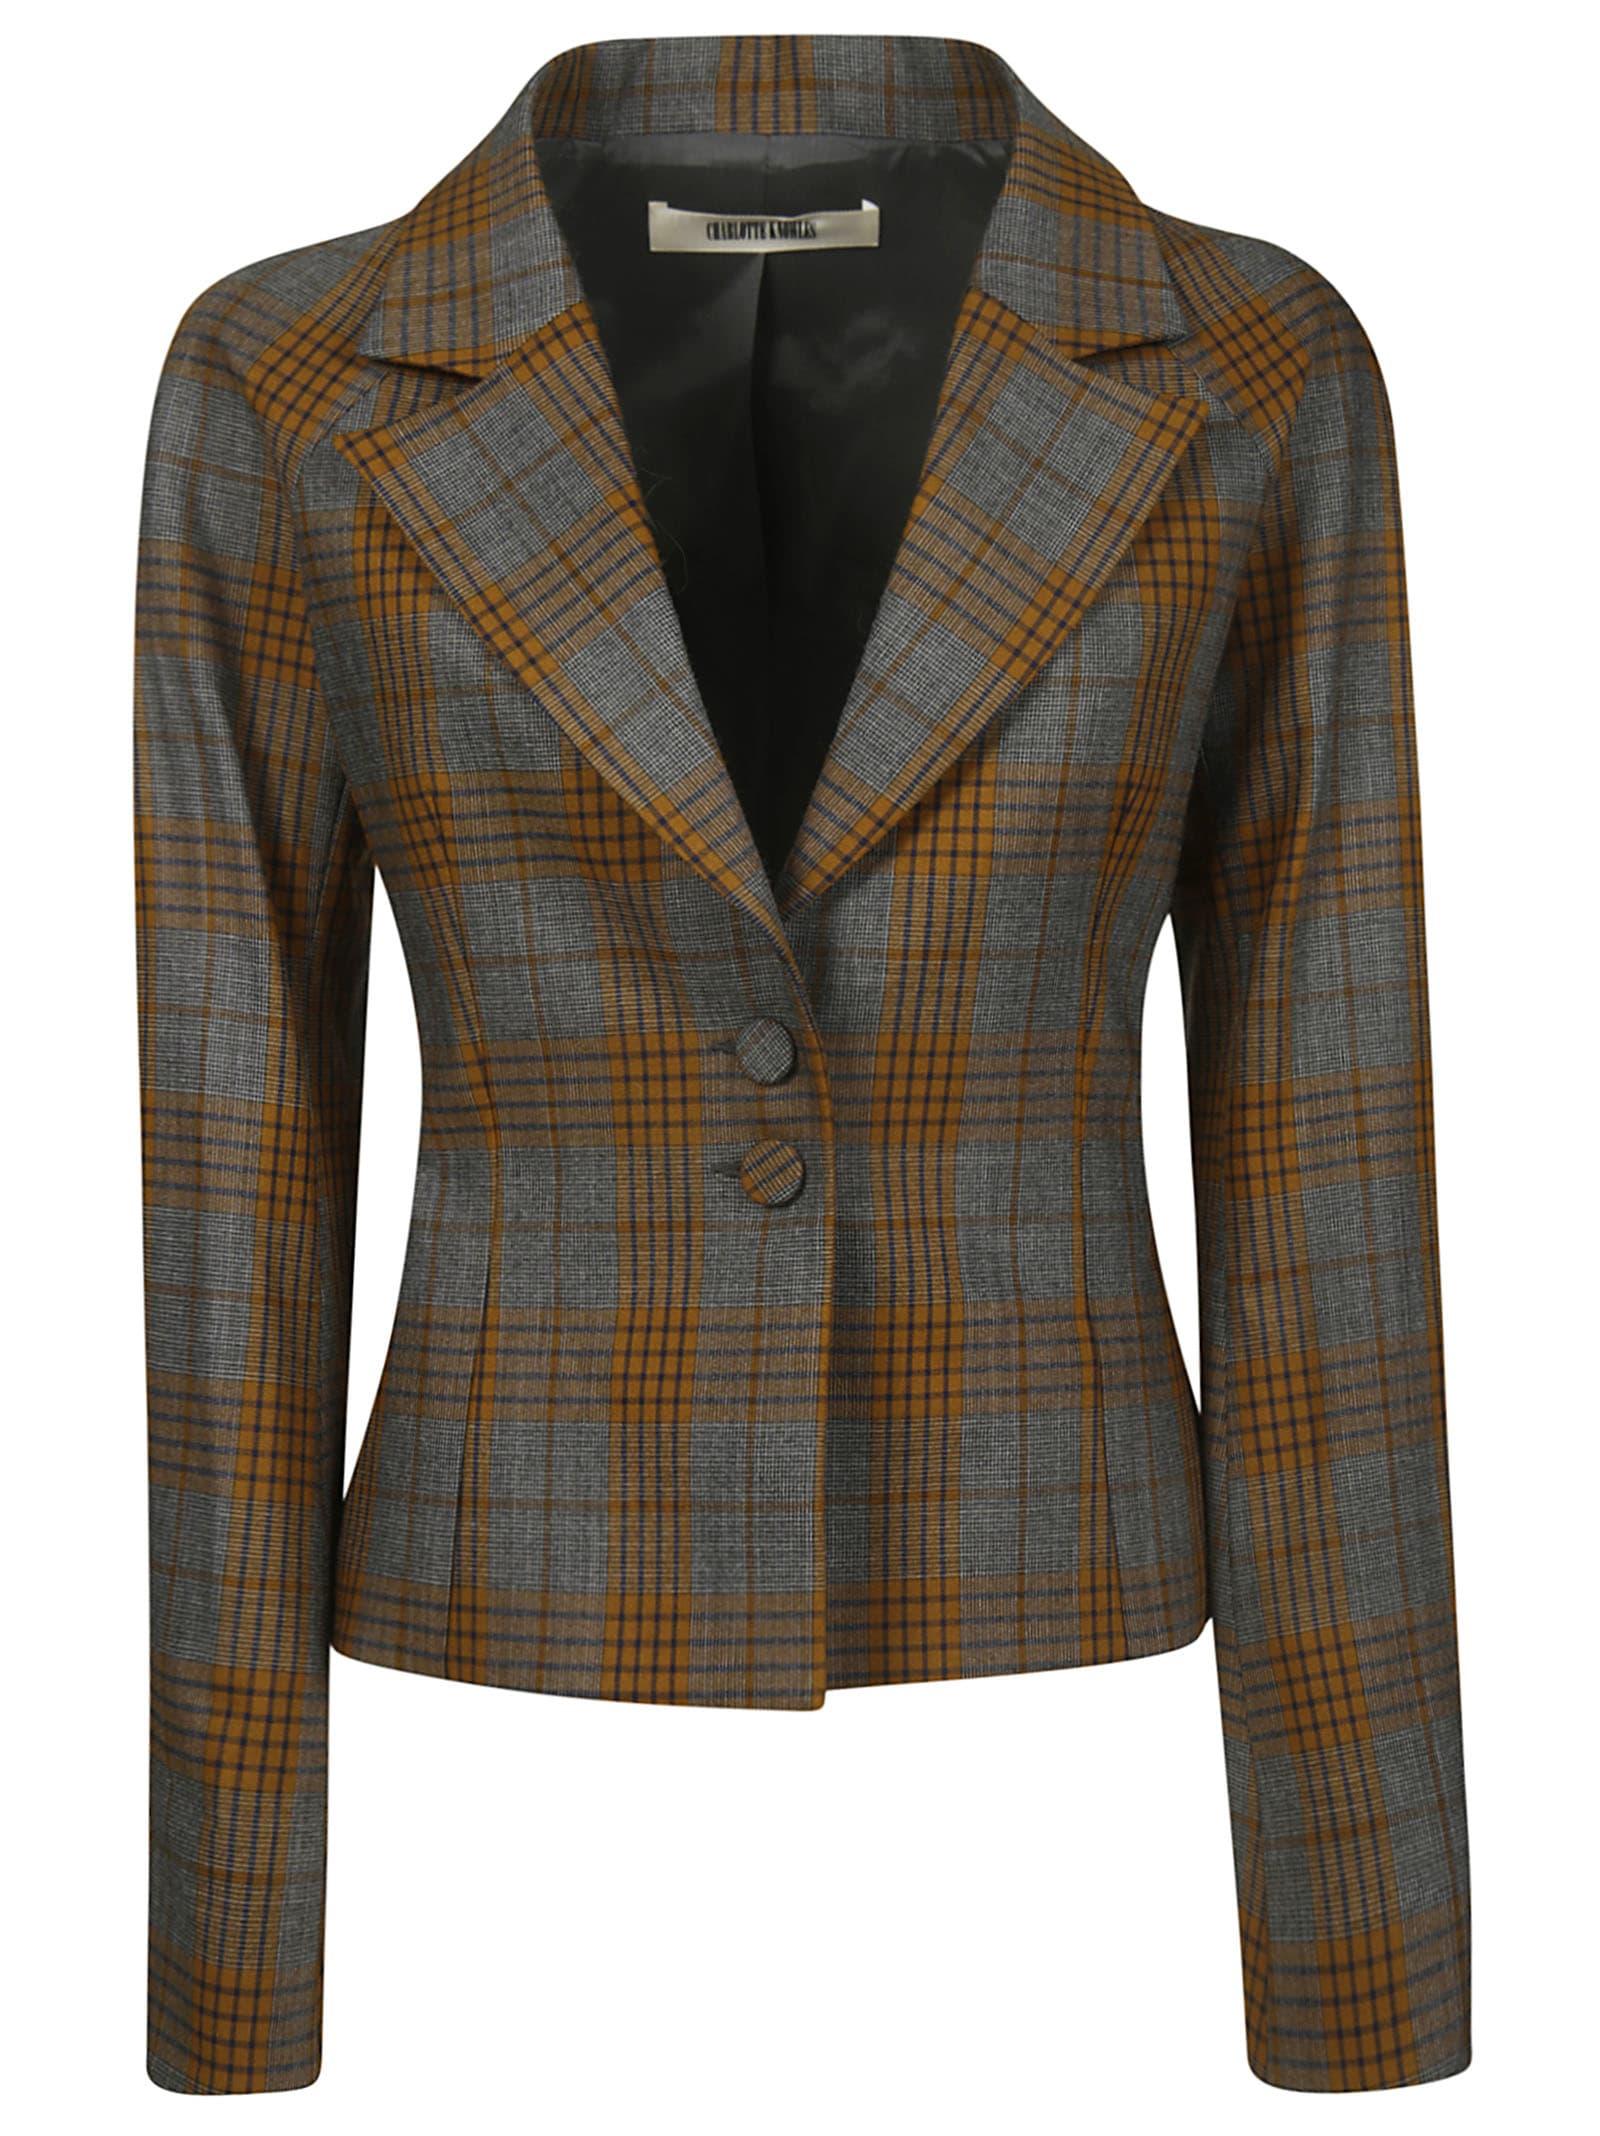 Charlotte Knowles Stream Jacket